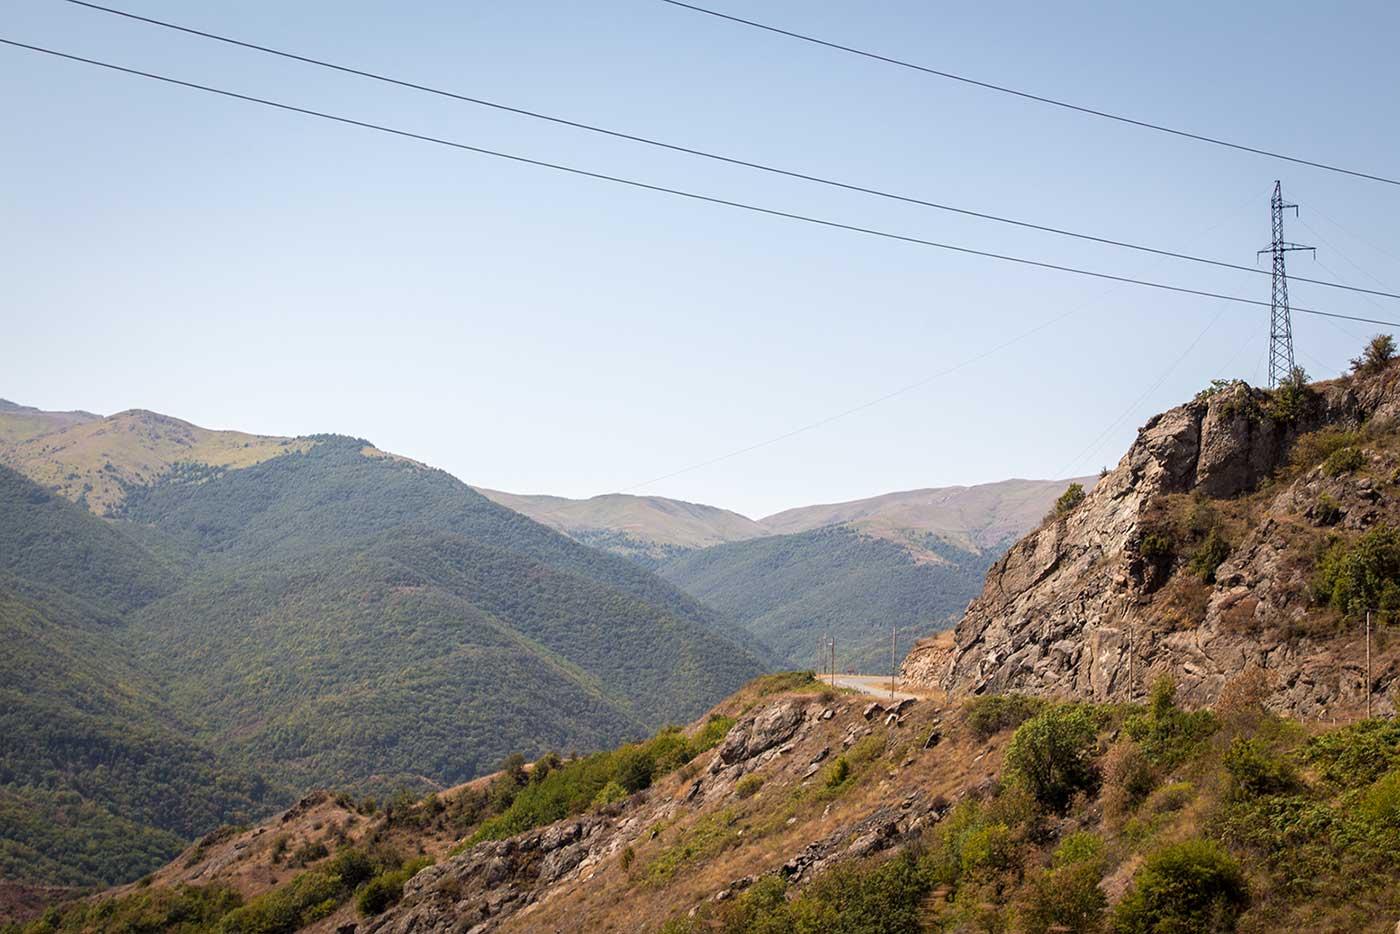 Mountain views on the road from Armenia to Nagorno-Karabakh.